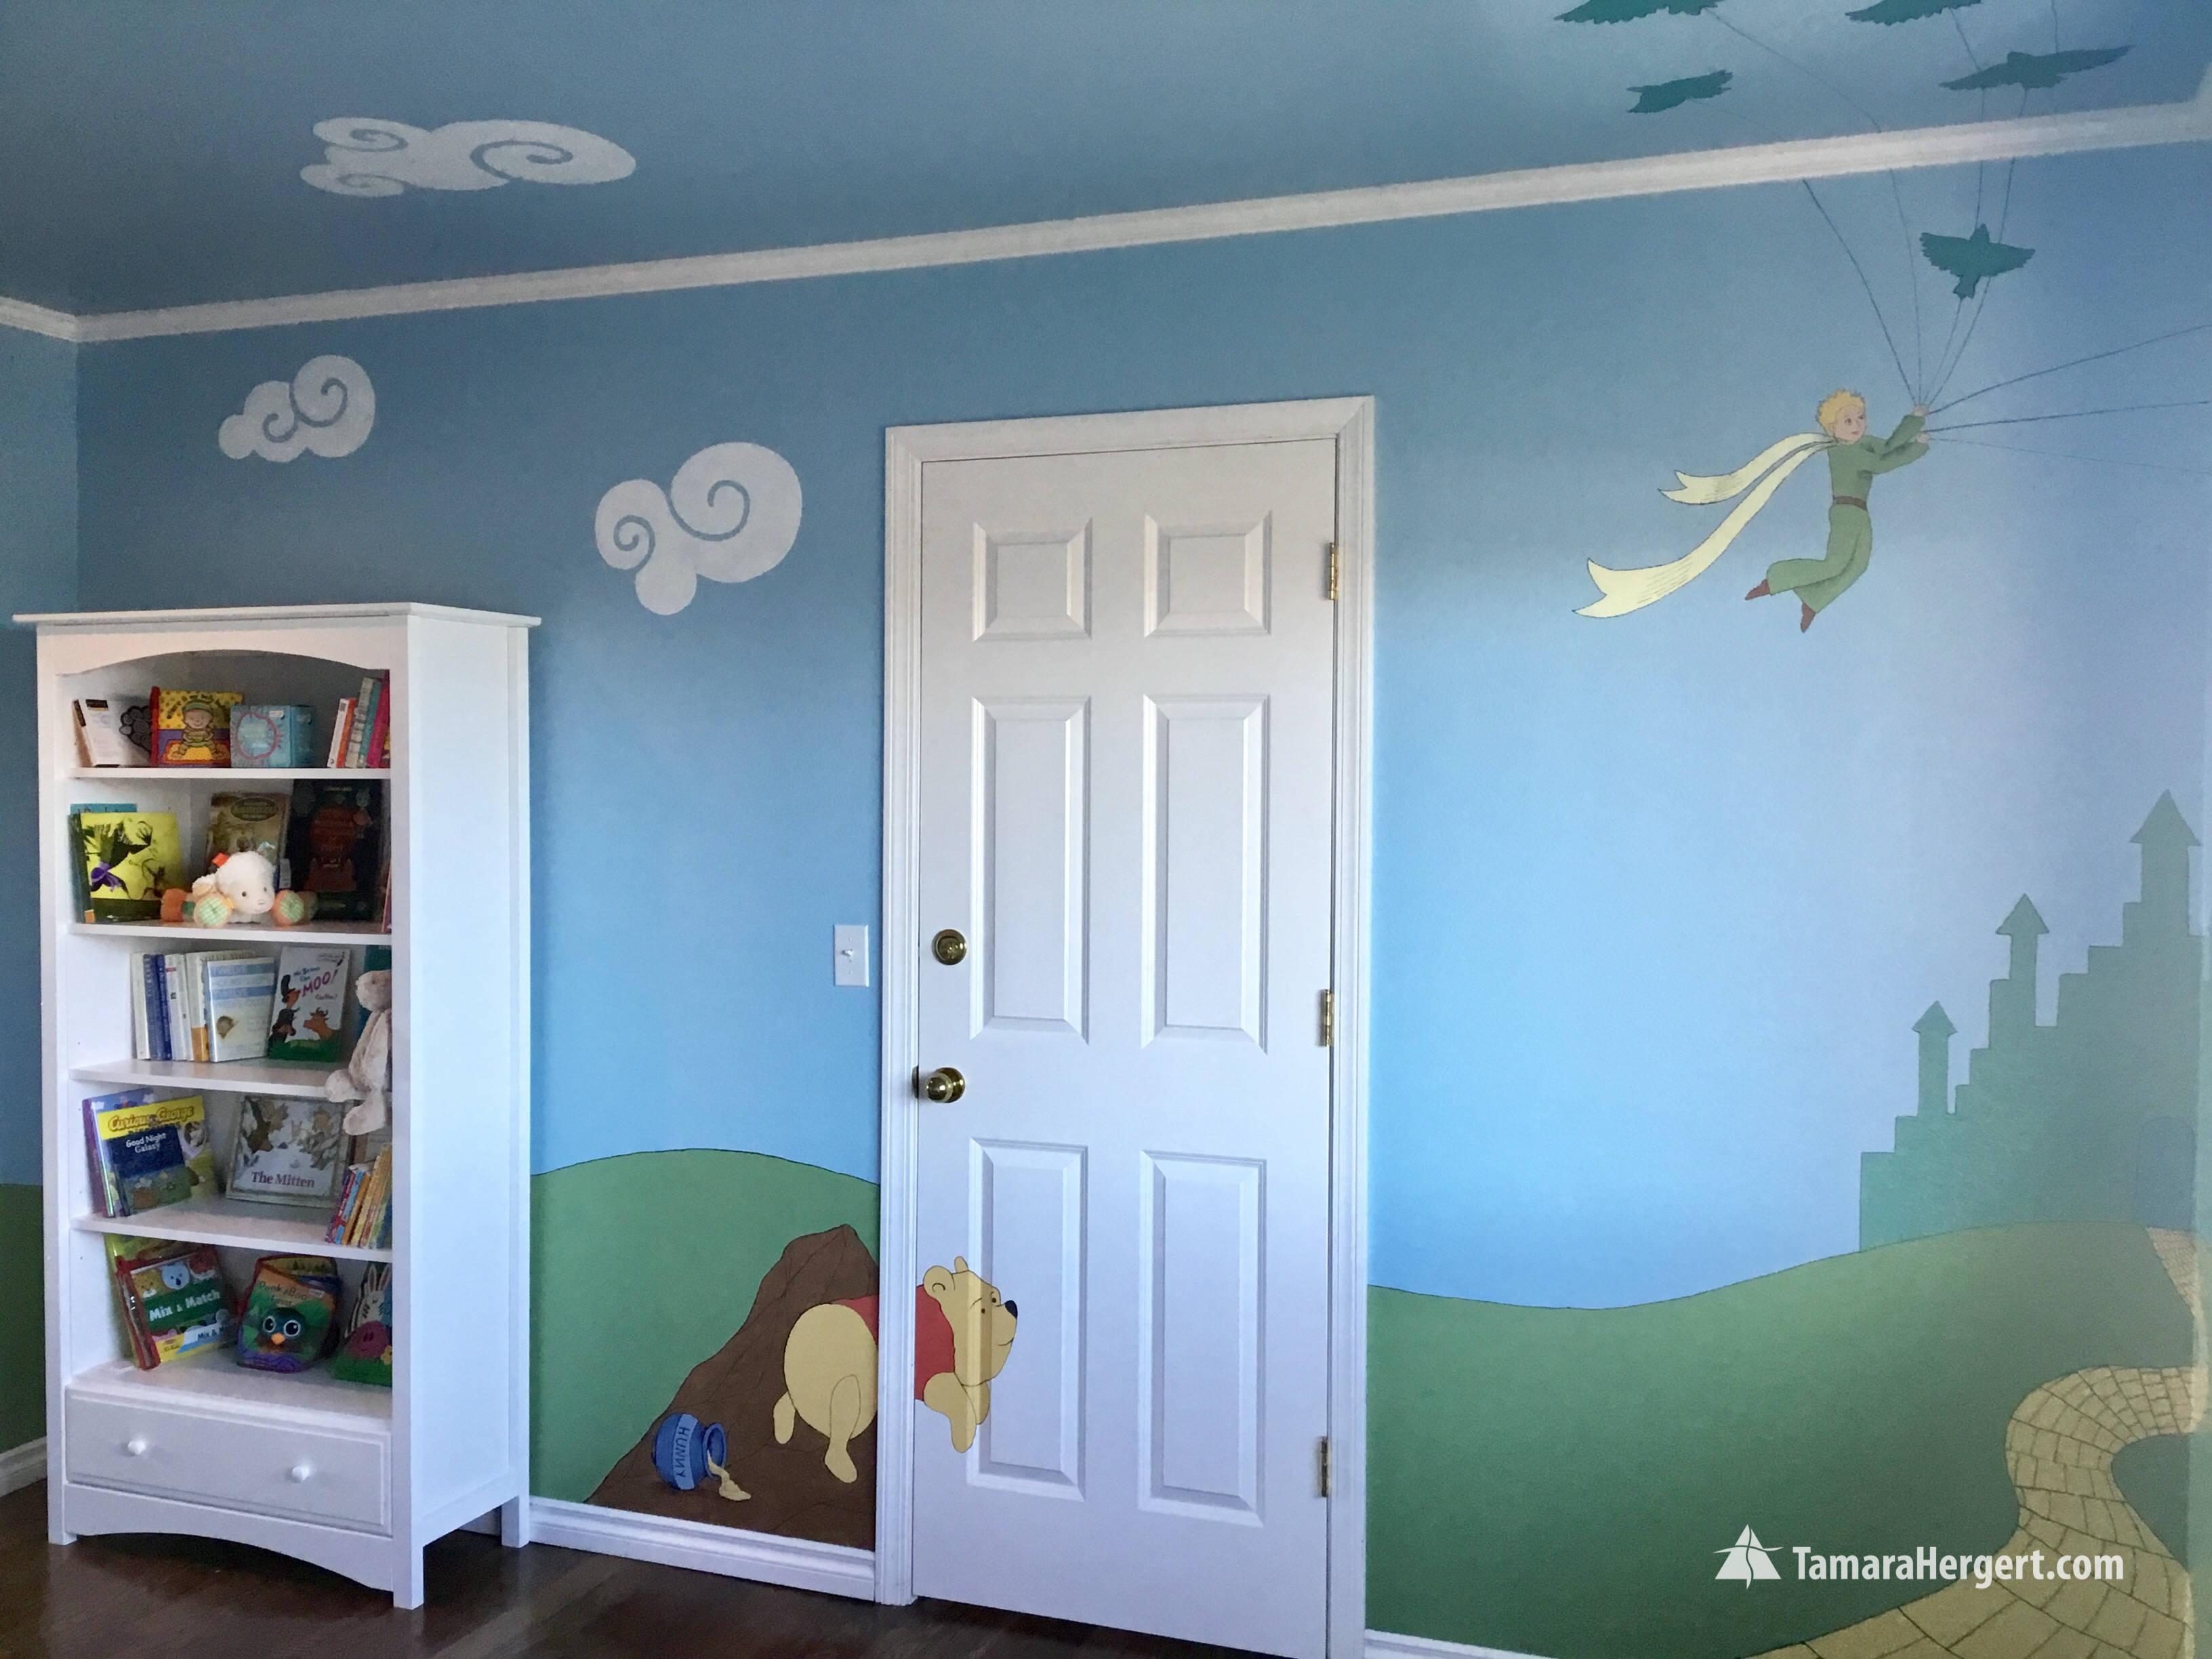 Story book mural by Tamara Hergert 25